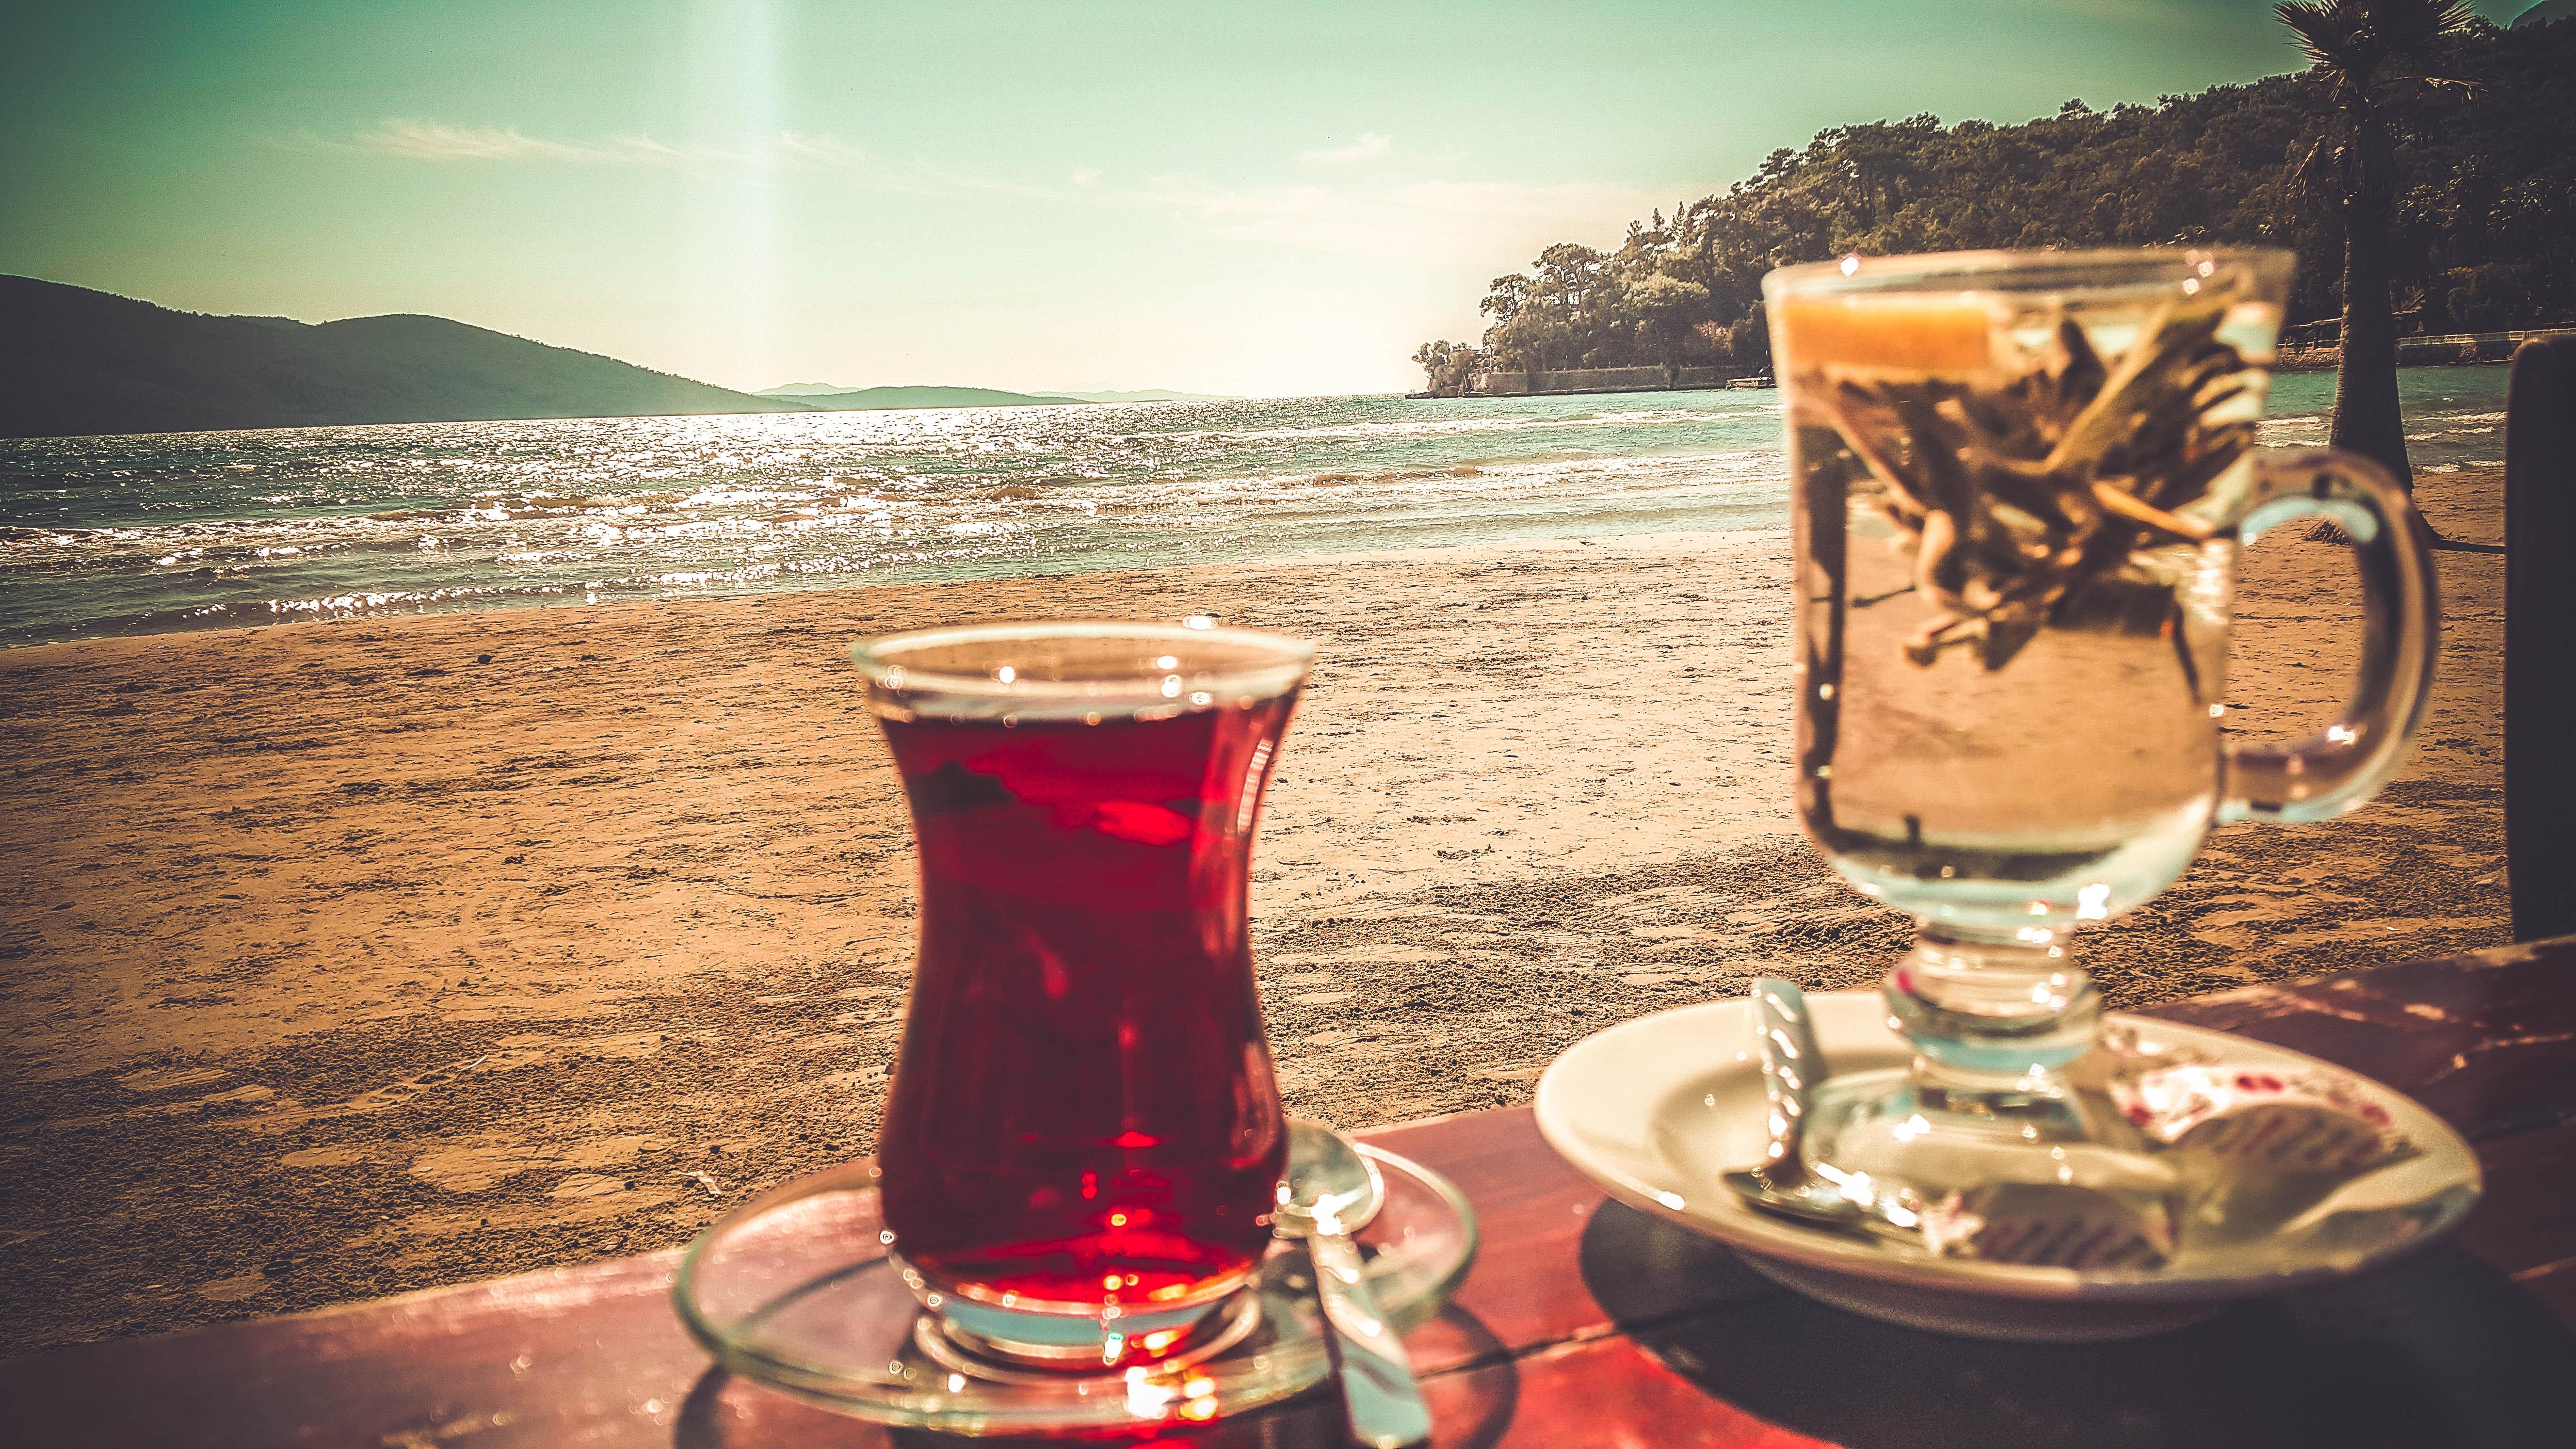 Clear turkish glass on saucer photo